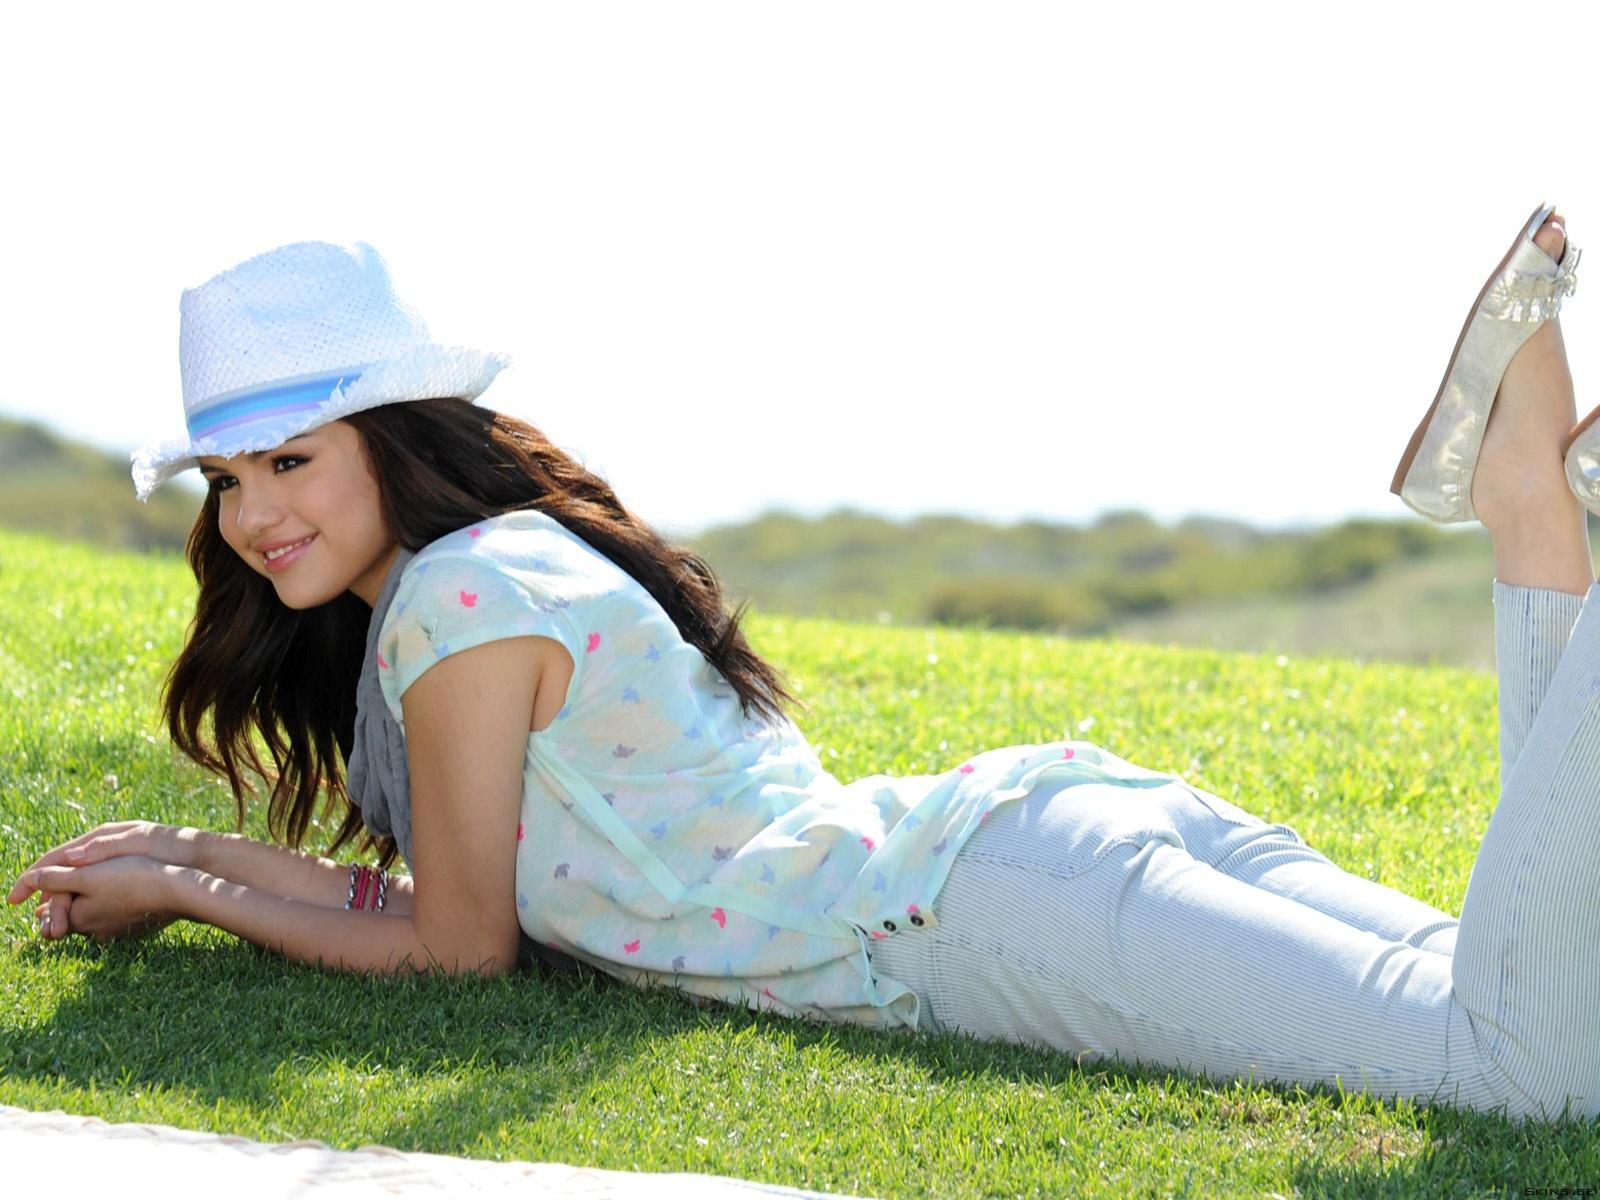 http://3.bp.blogspot.com/-pVzbLy8JYjo/TteybeEhsII/AAAAAAAAANg/QFw_LuhStbc/s1600/Selena+Gomez+03.jpg